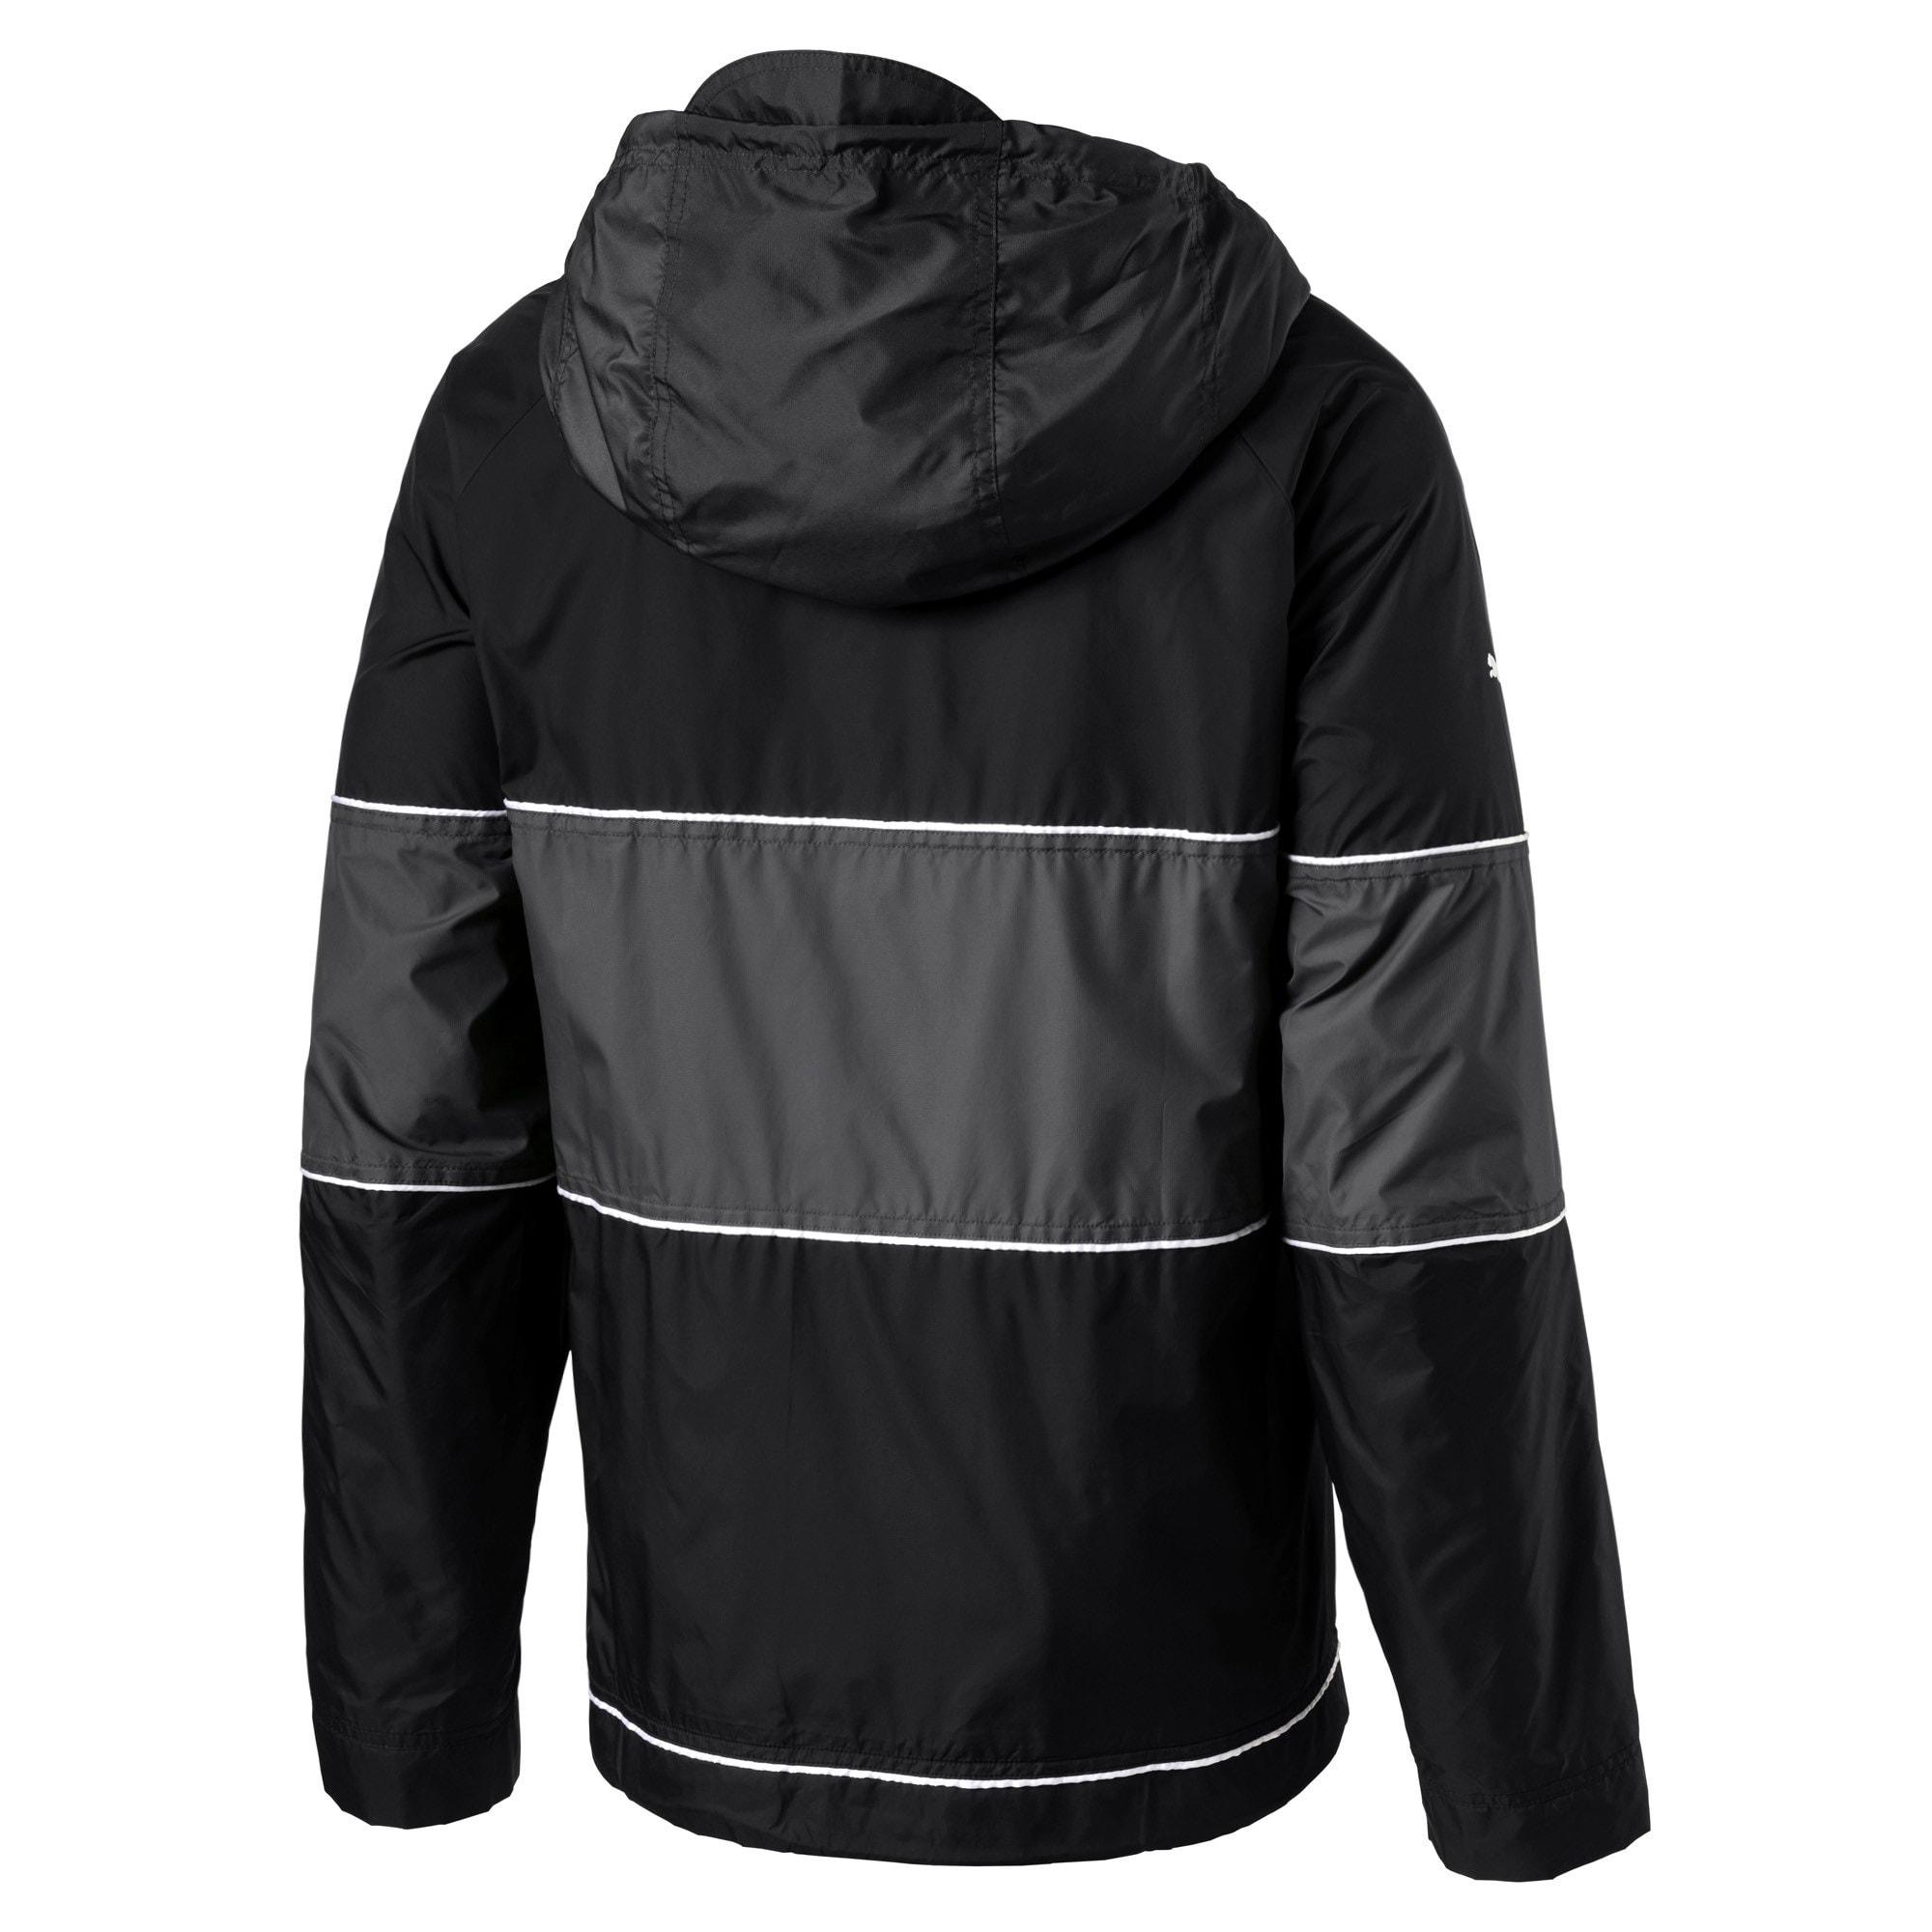 Thumbnail 2 of BMW Motorsport RCT Woven Hooded Men's Jacket, Puma Black, medium